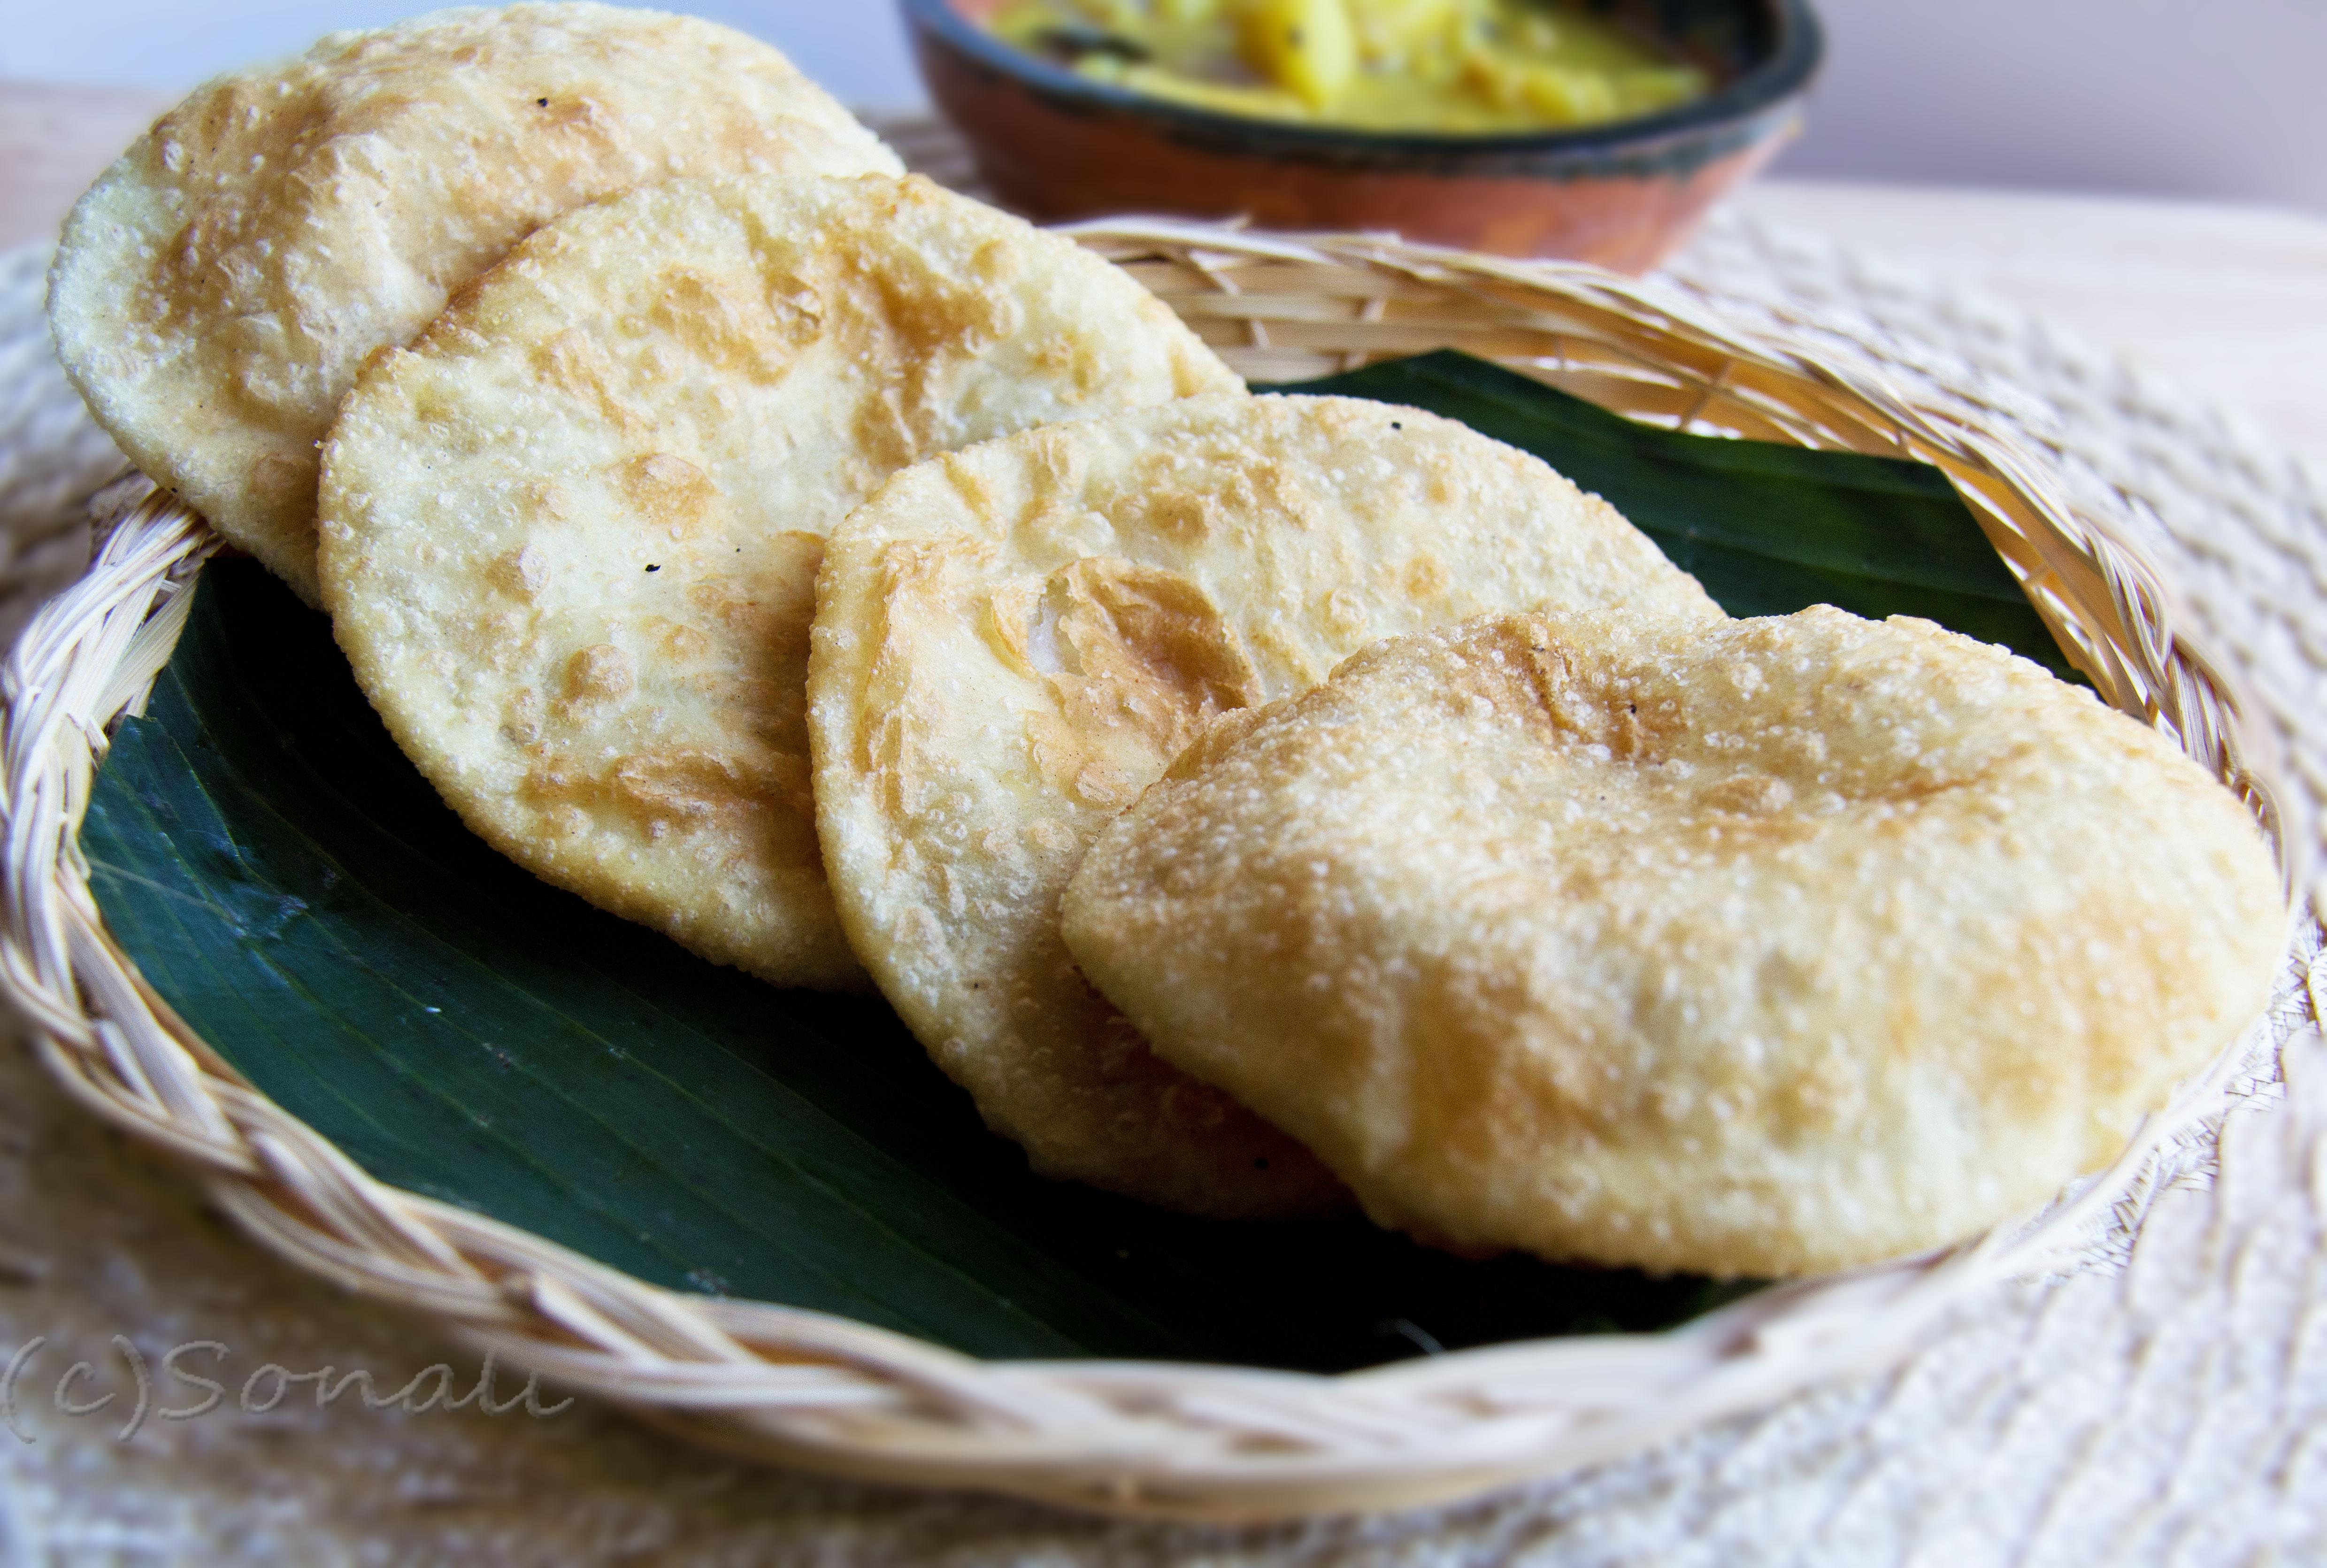 Hinger Kochuri with Alur Torkari : A grand breakfast for Maha Saptami